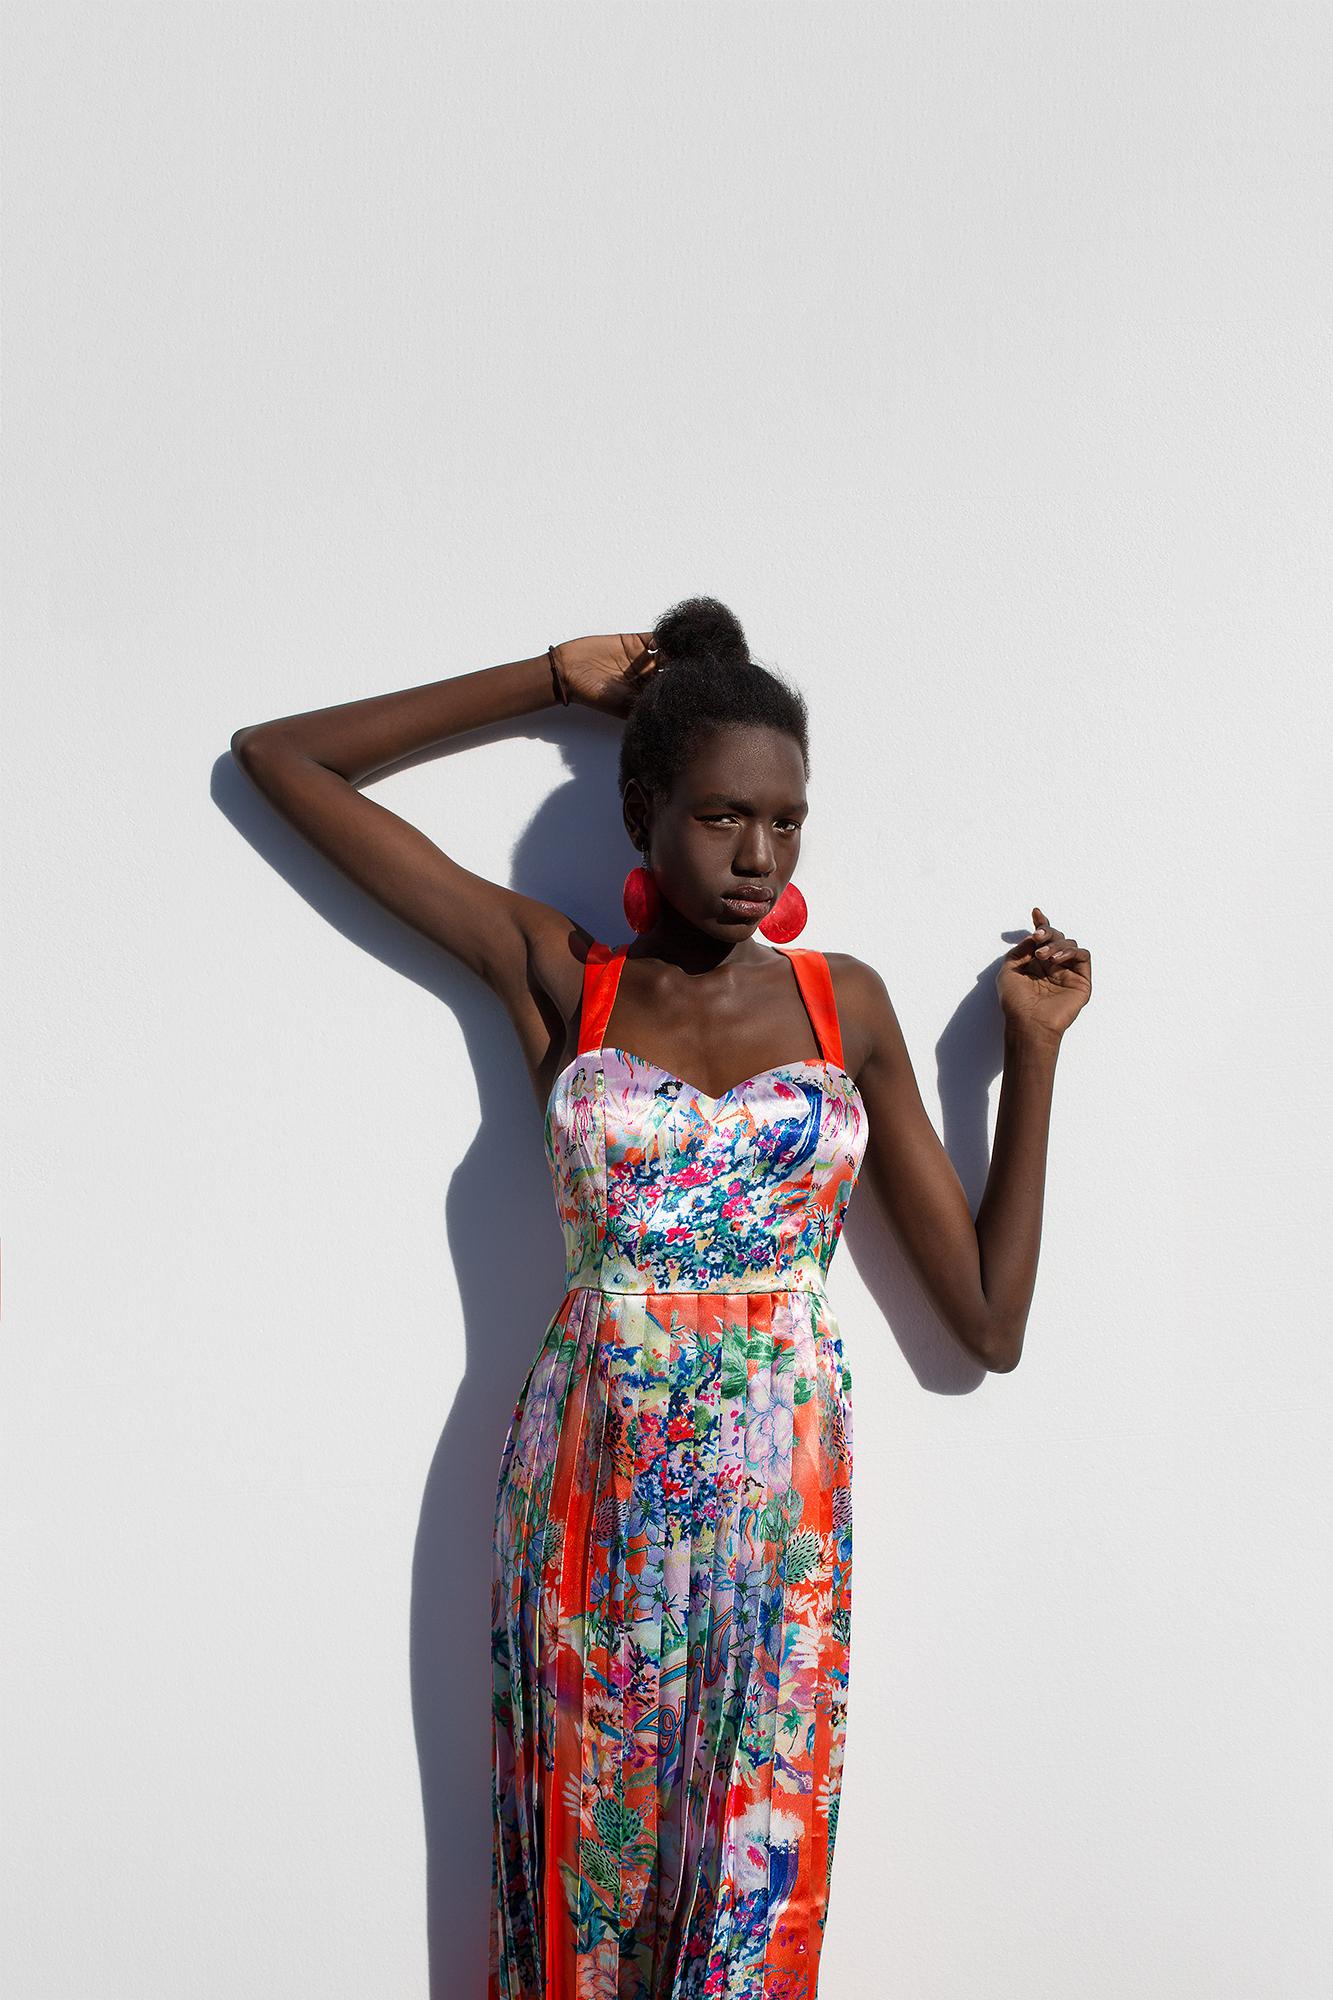 fashionphotography_jasminazuccarelli.jpg